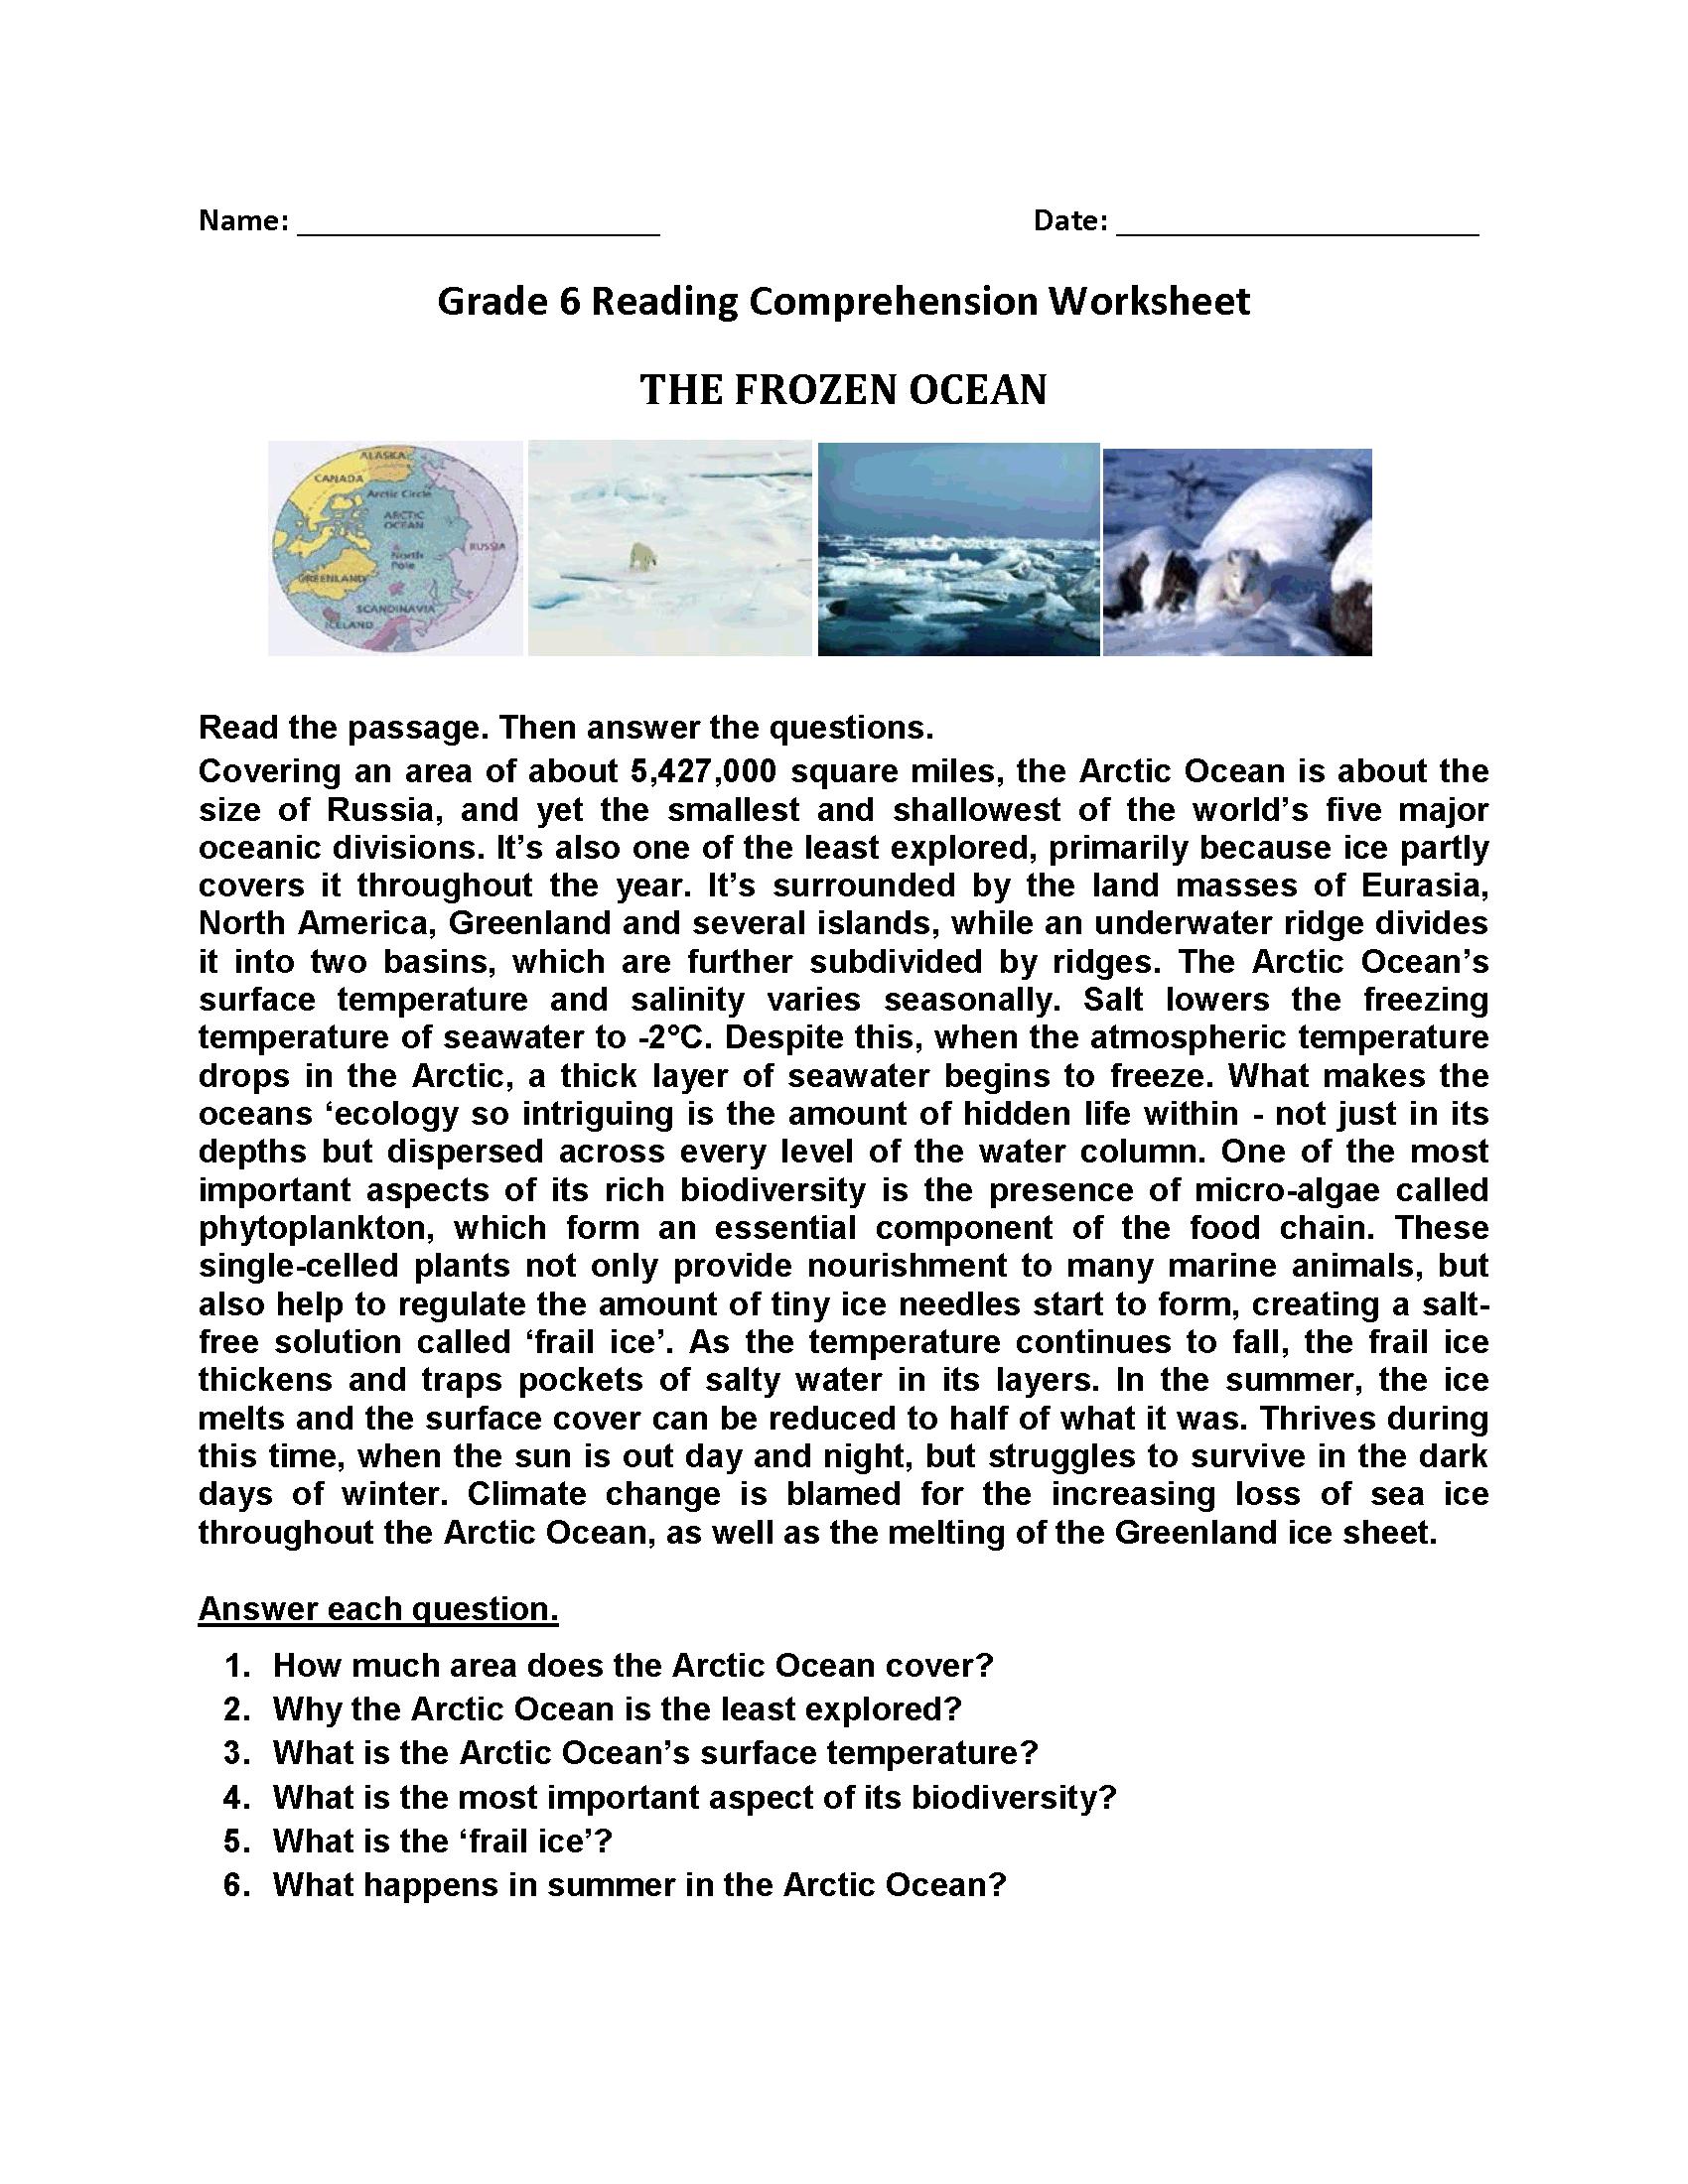 The Frozen Ocean Reading Comprehension